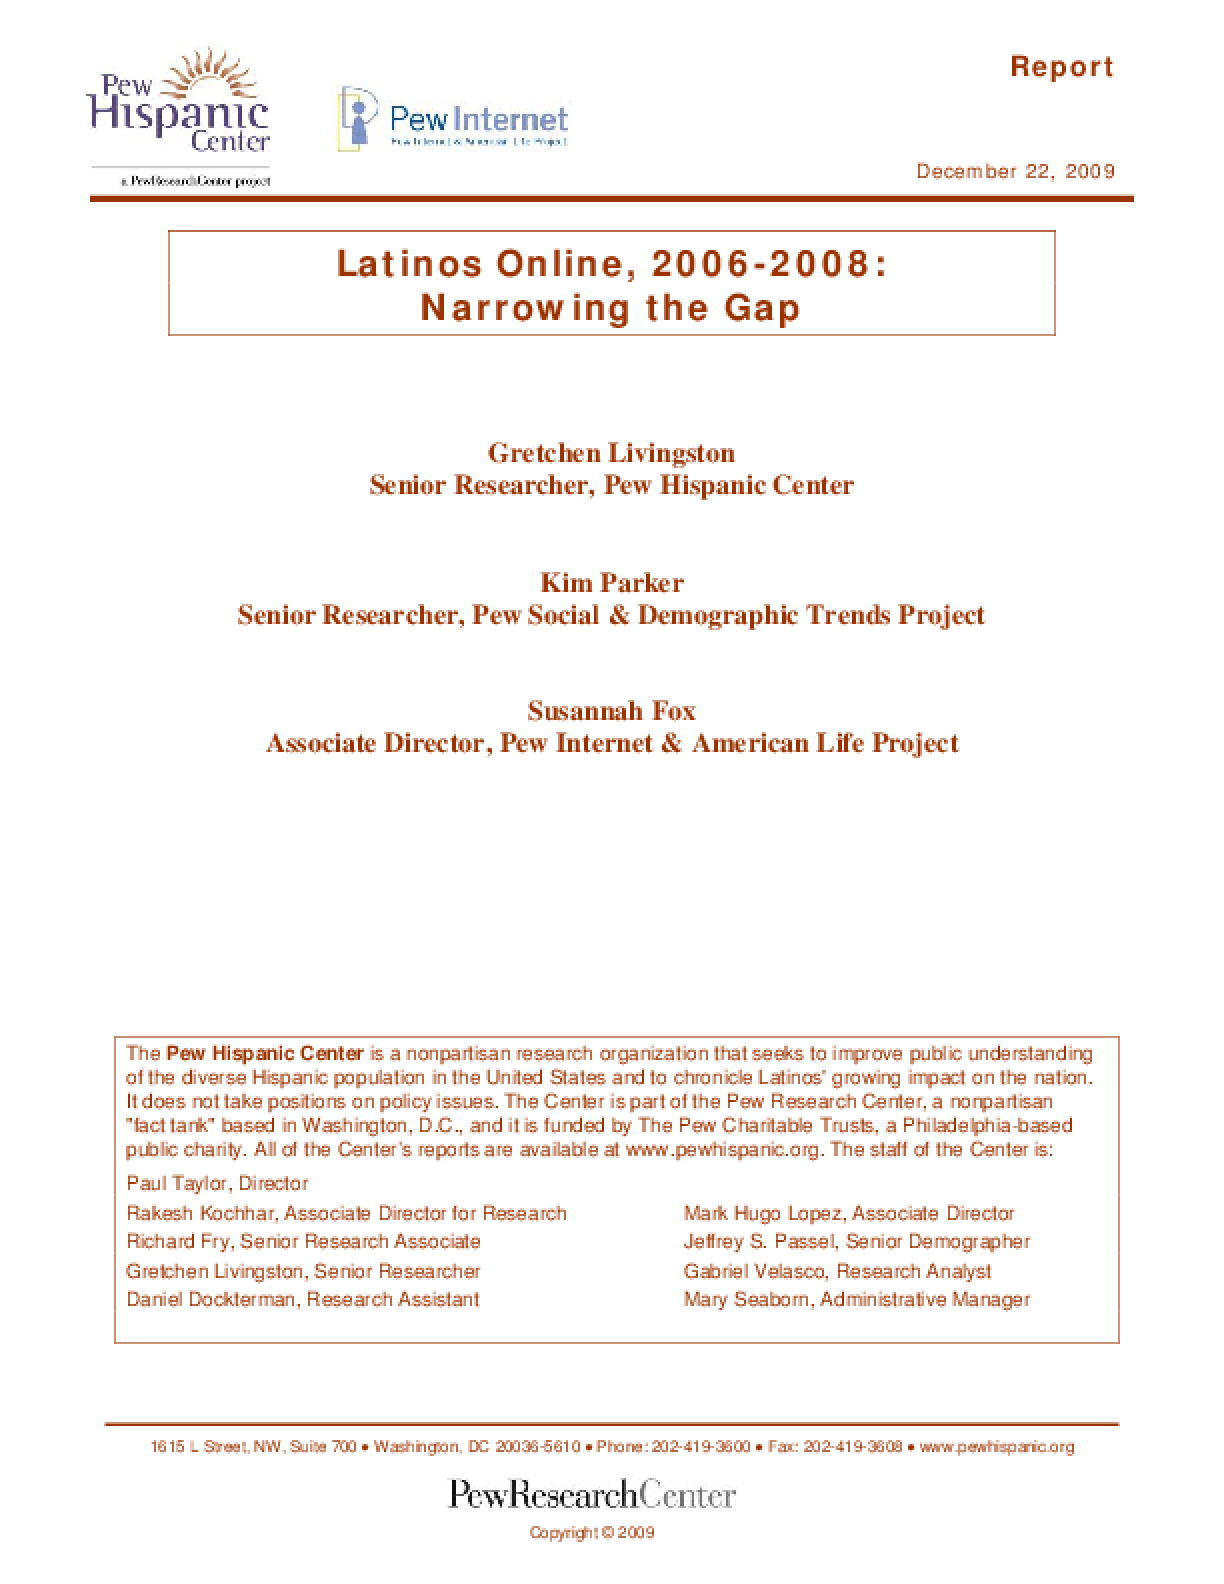 Latinos Online, 2006-2008: Narrowing the Gap